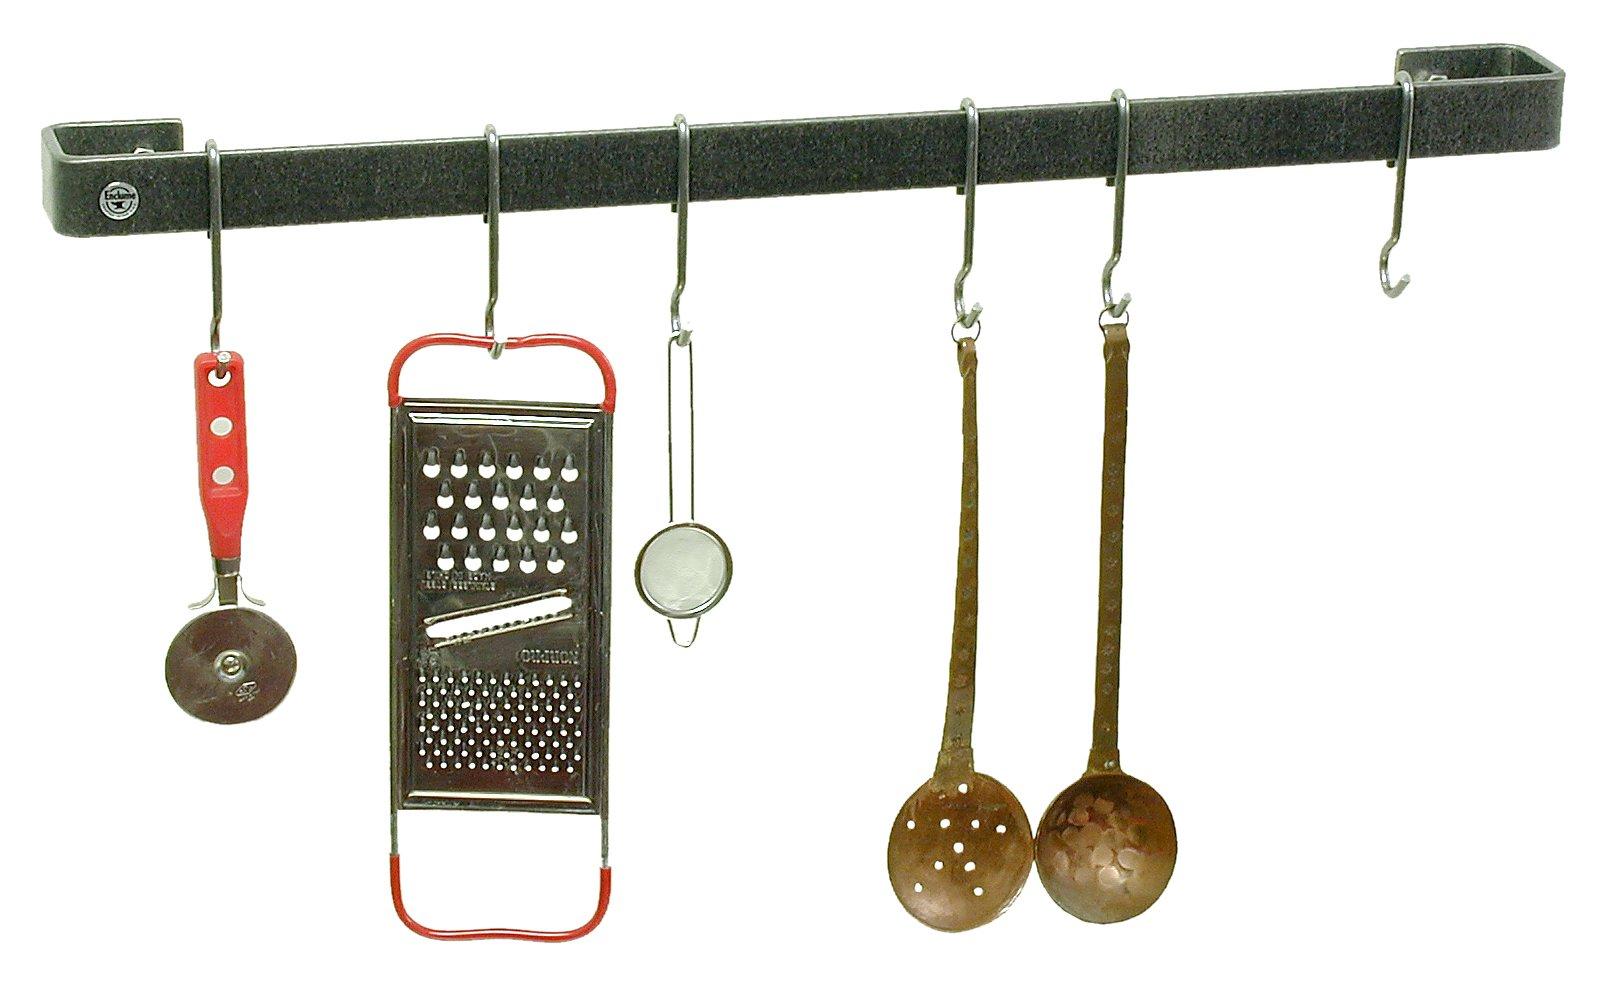 Enclume Premier 30-Inch Utensil Bar Wall Pot Rack, Hammered Steel